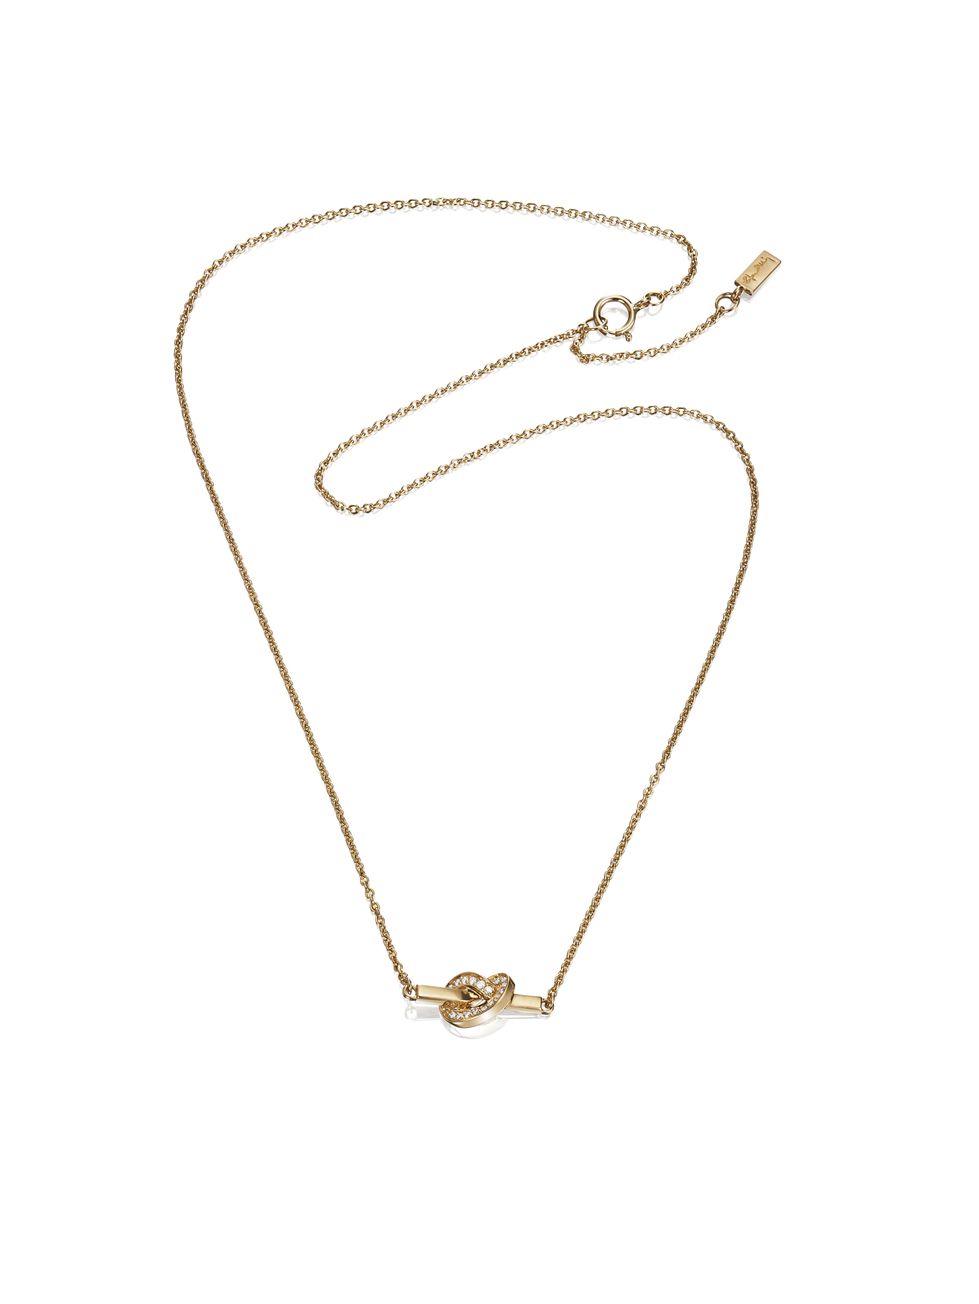 Love Knot & Stars Necklace 10-101-01303(1)